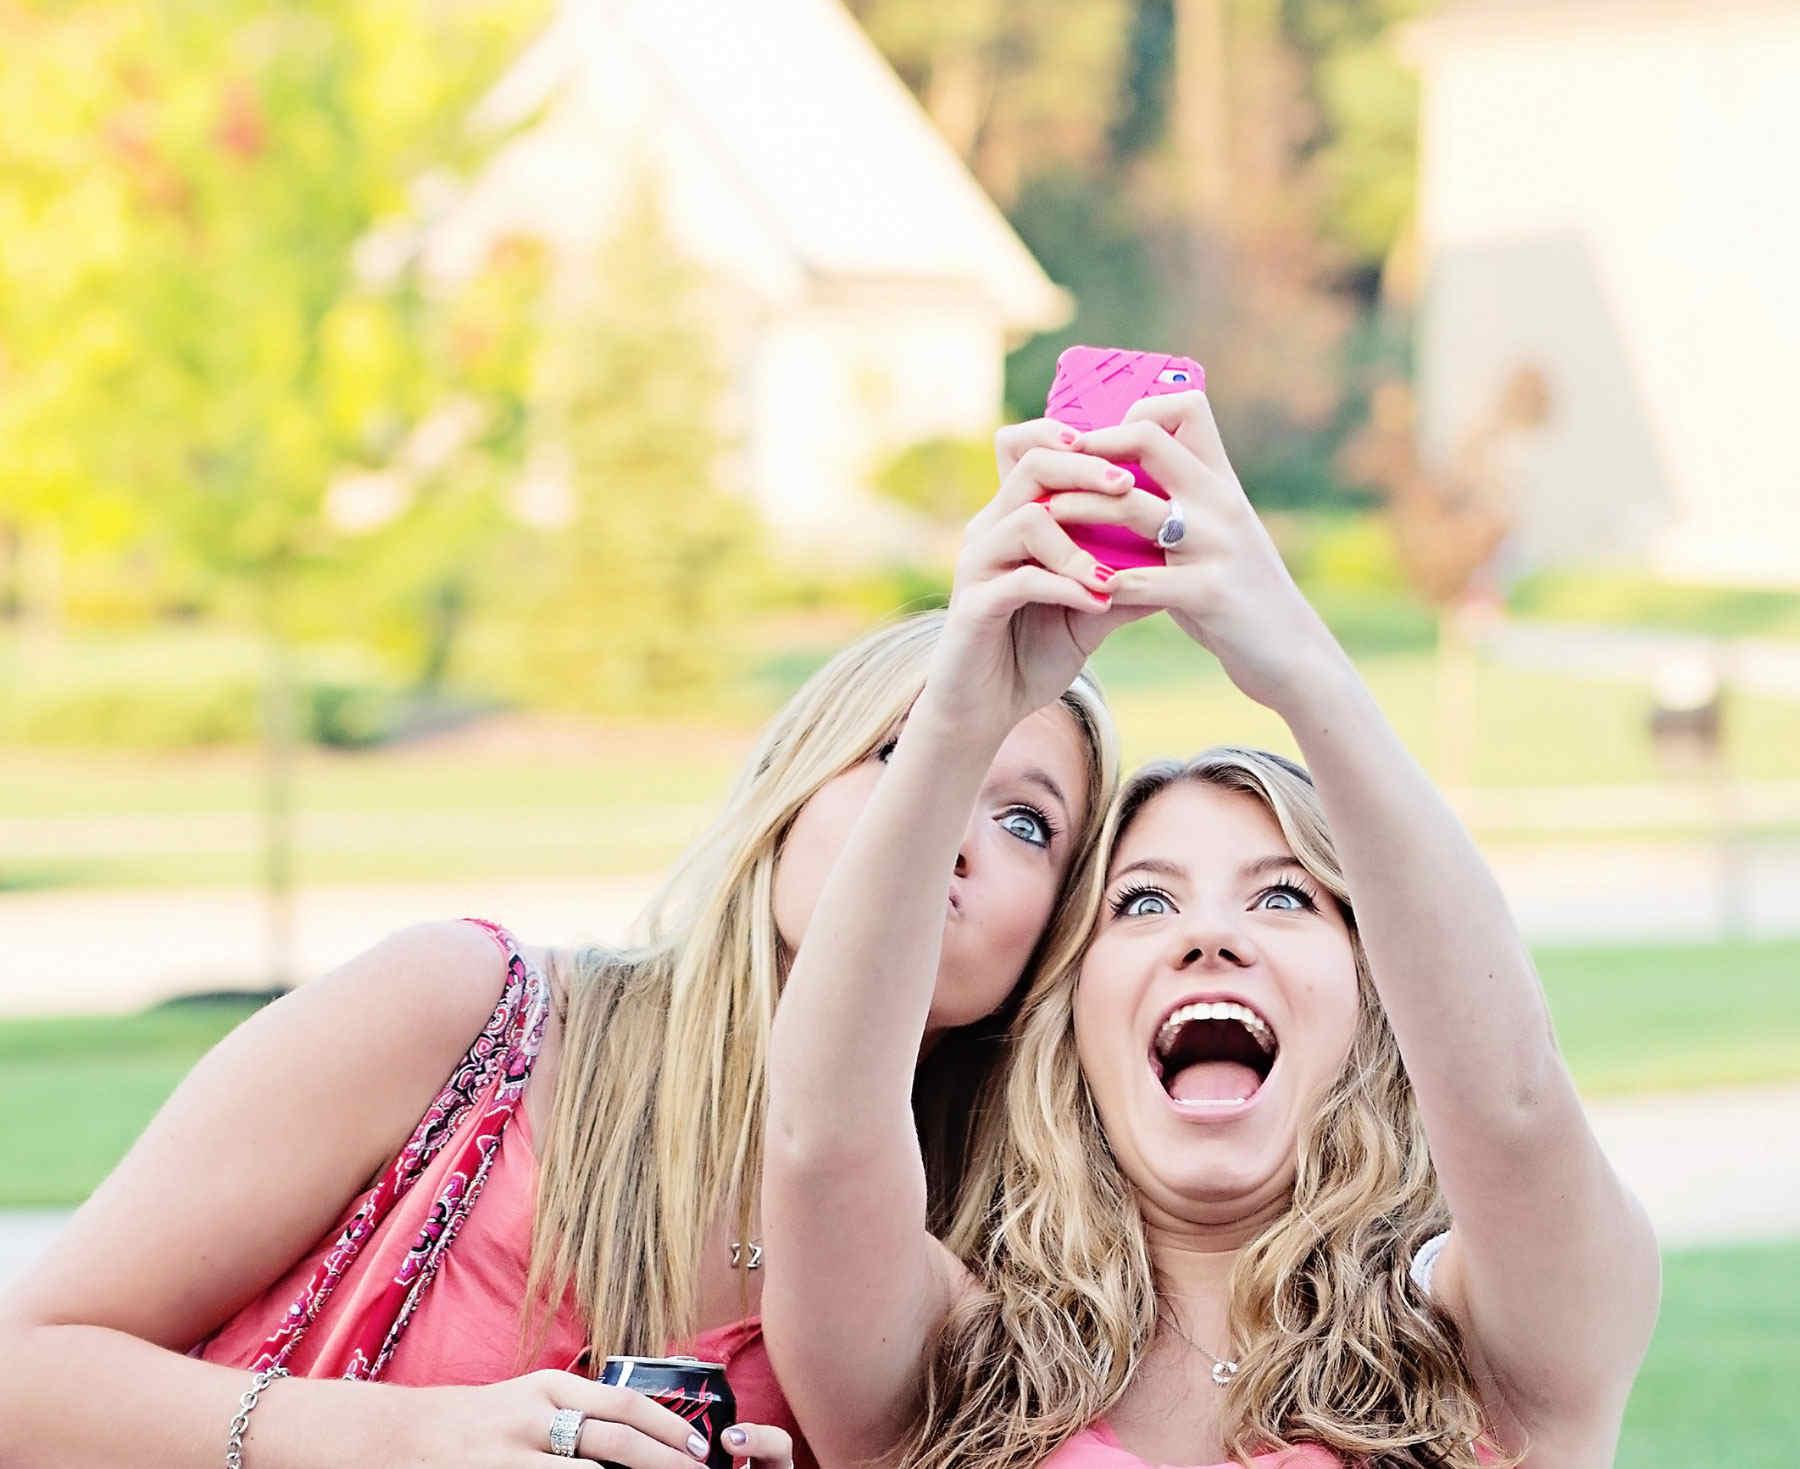 aplicacion para smartphone snapchat